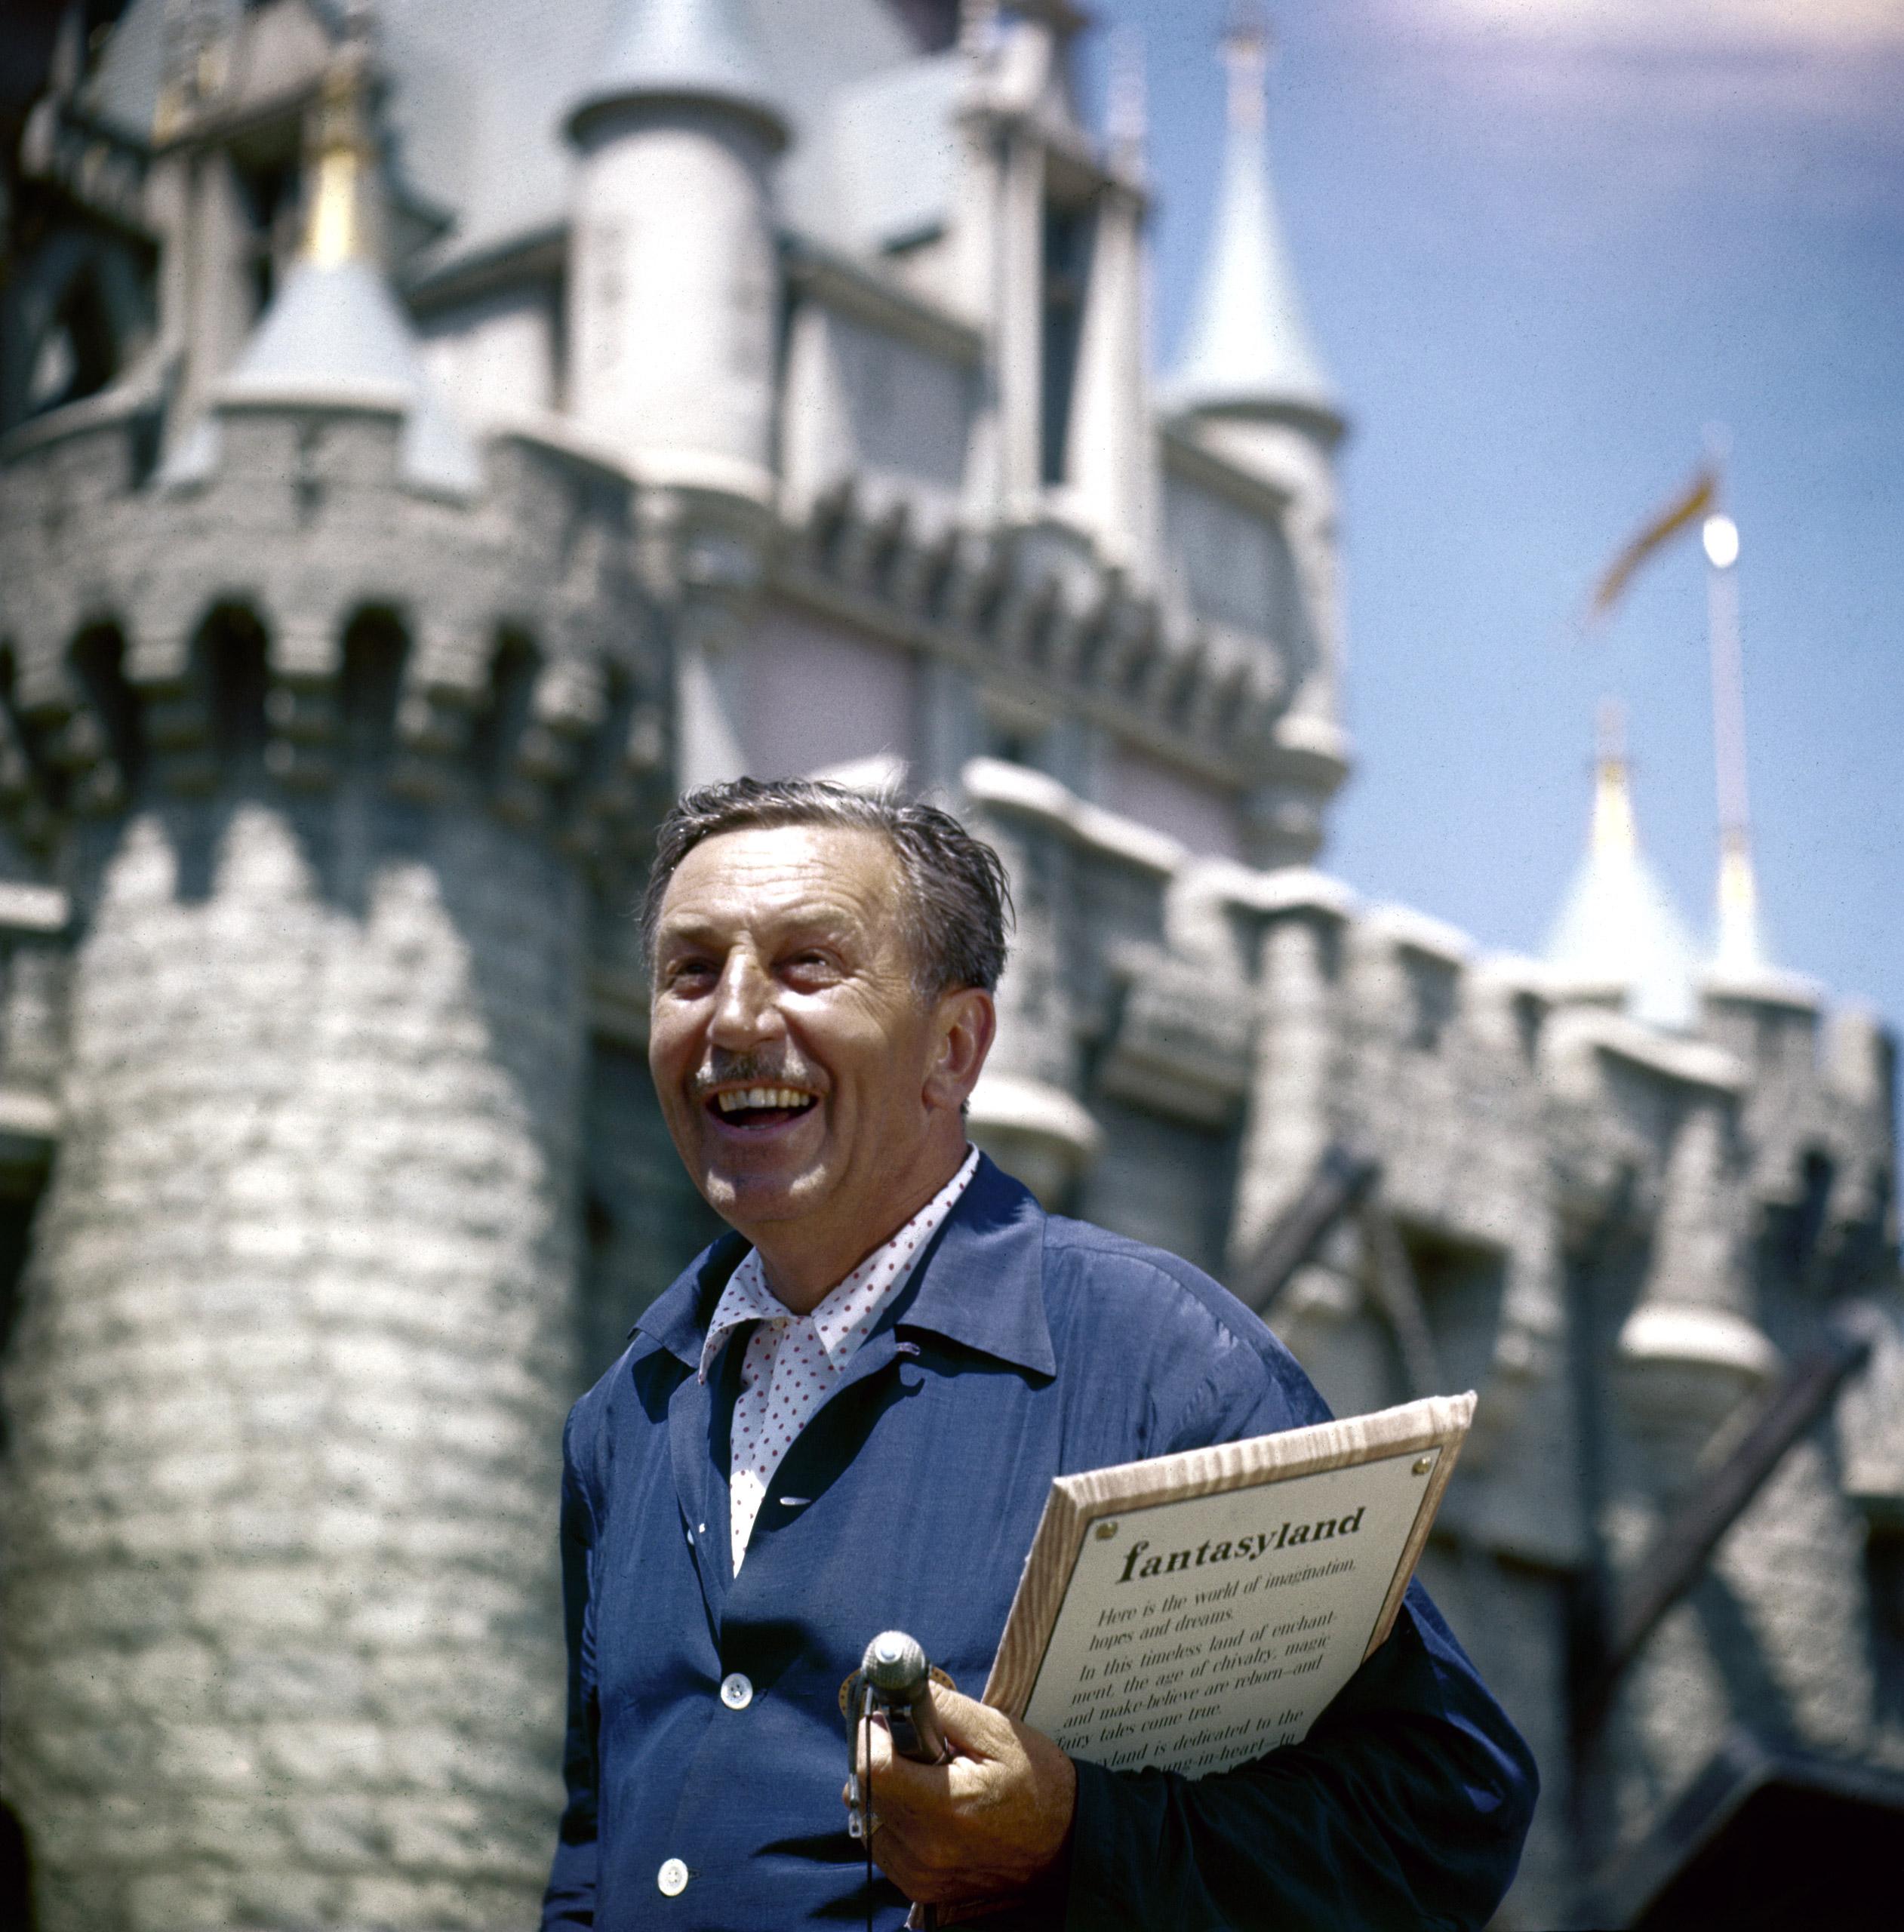 Walt Disney standing in front of Fantasyland Castle at Disneyland.